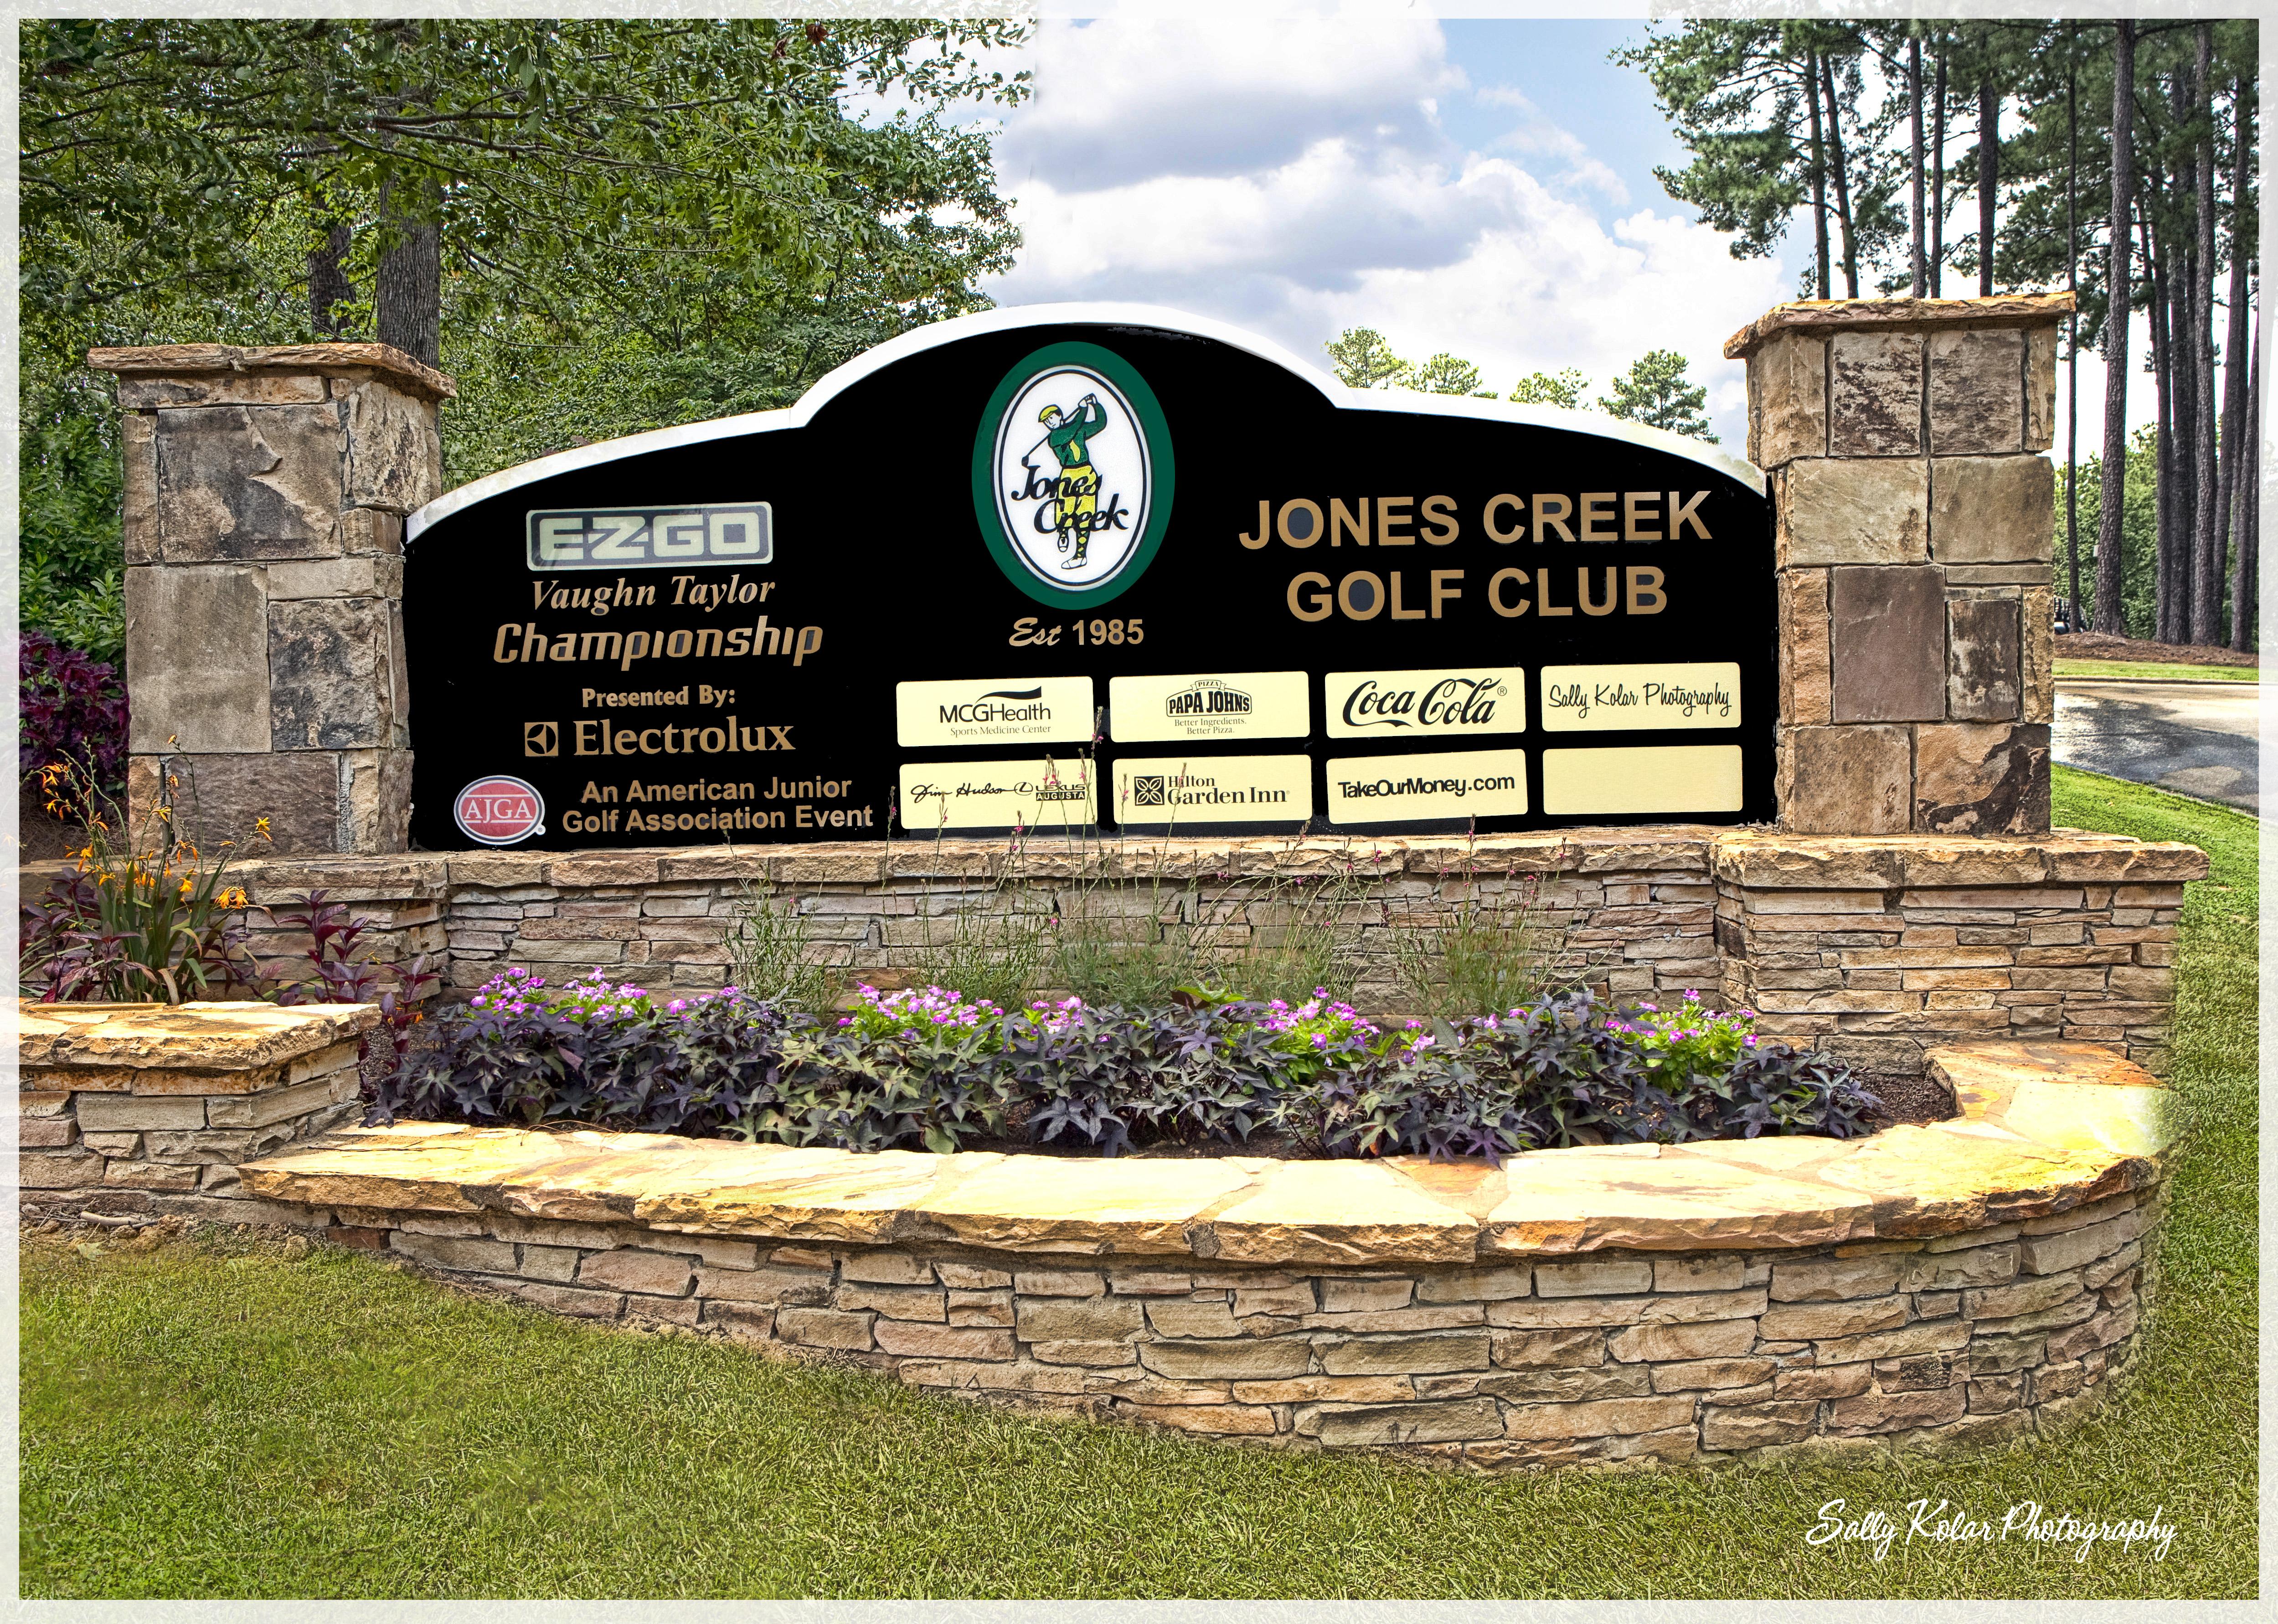 Jim Hudson Lexus >> WE LOVE JONES CREEK GOLF CLUB!!! - Sally Kolar Photography